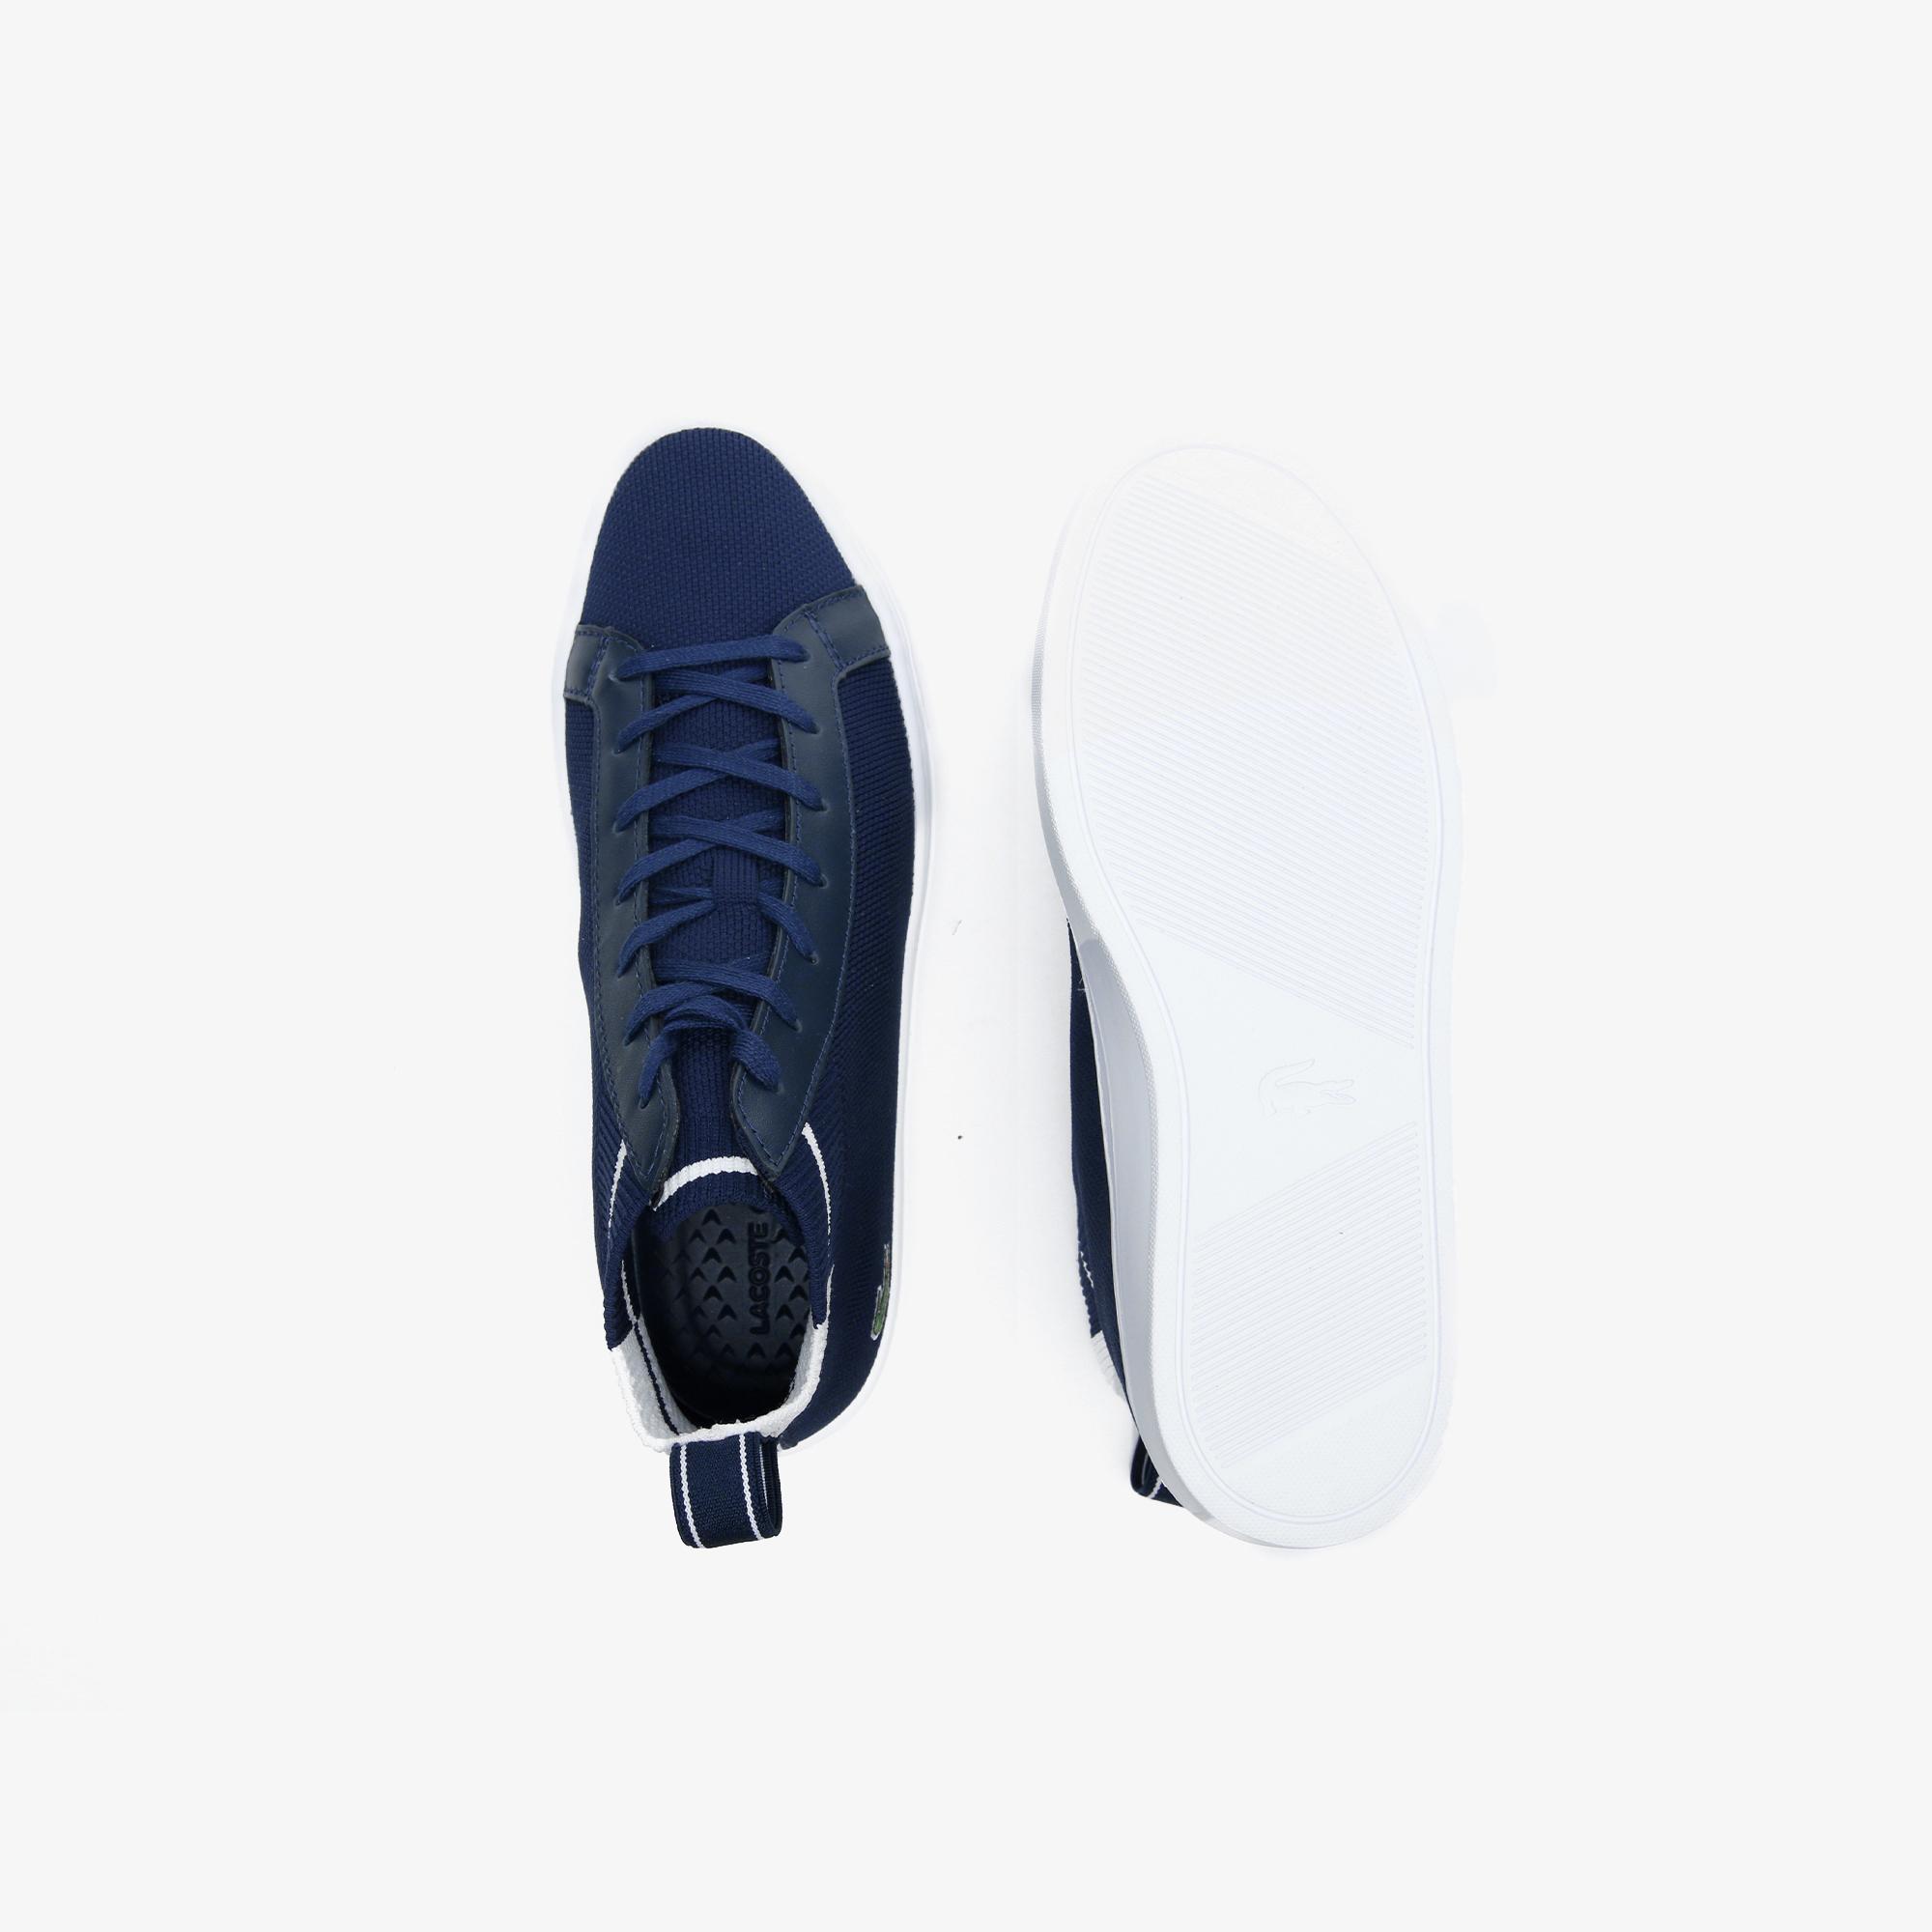 Lacoste La Piquee Mid 0721 1 Cma Erkek Lacivert - Beyaz Mid Ayakkabı